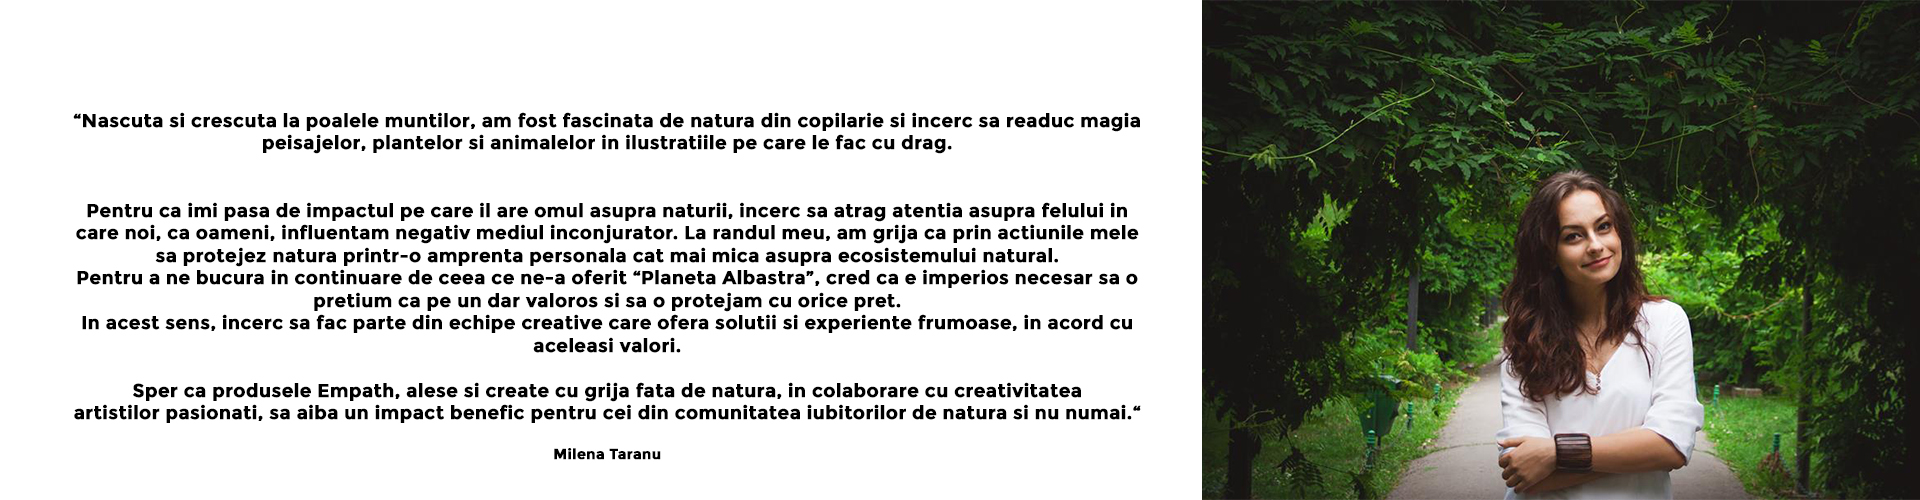 prezentare Milena